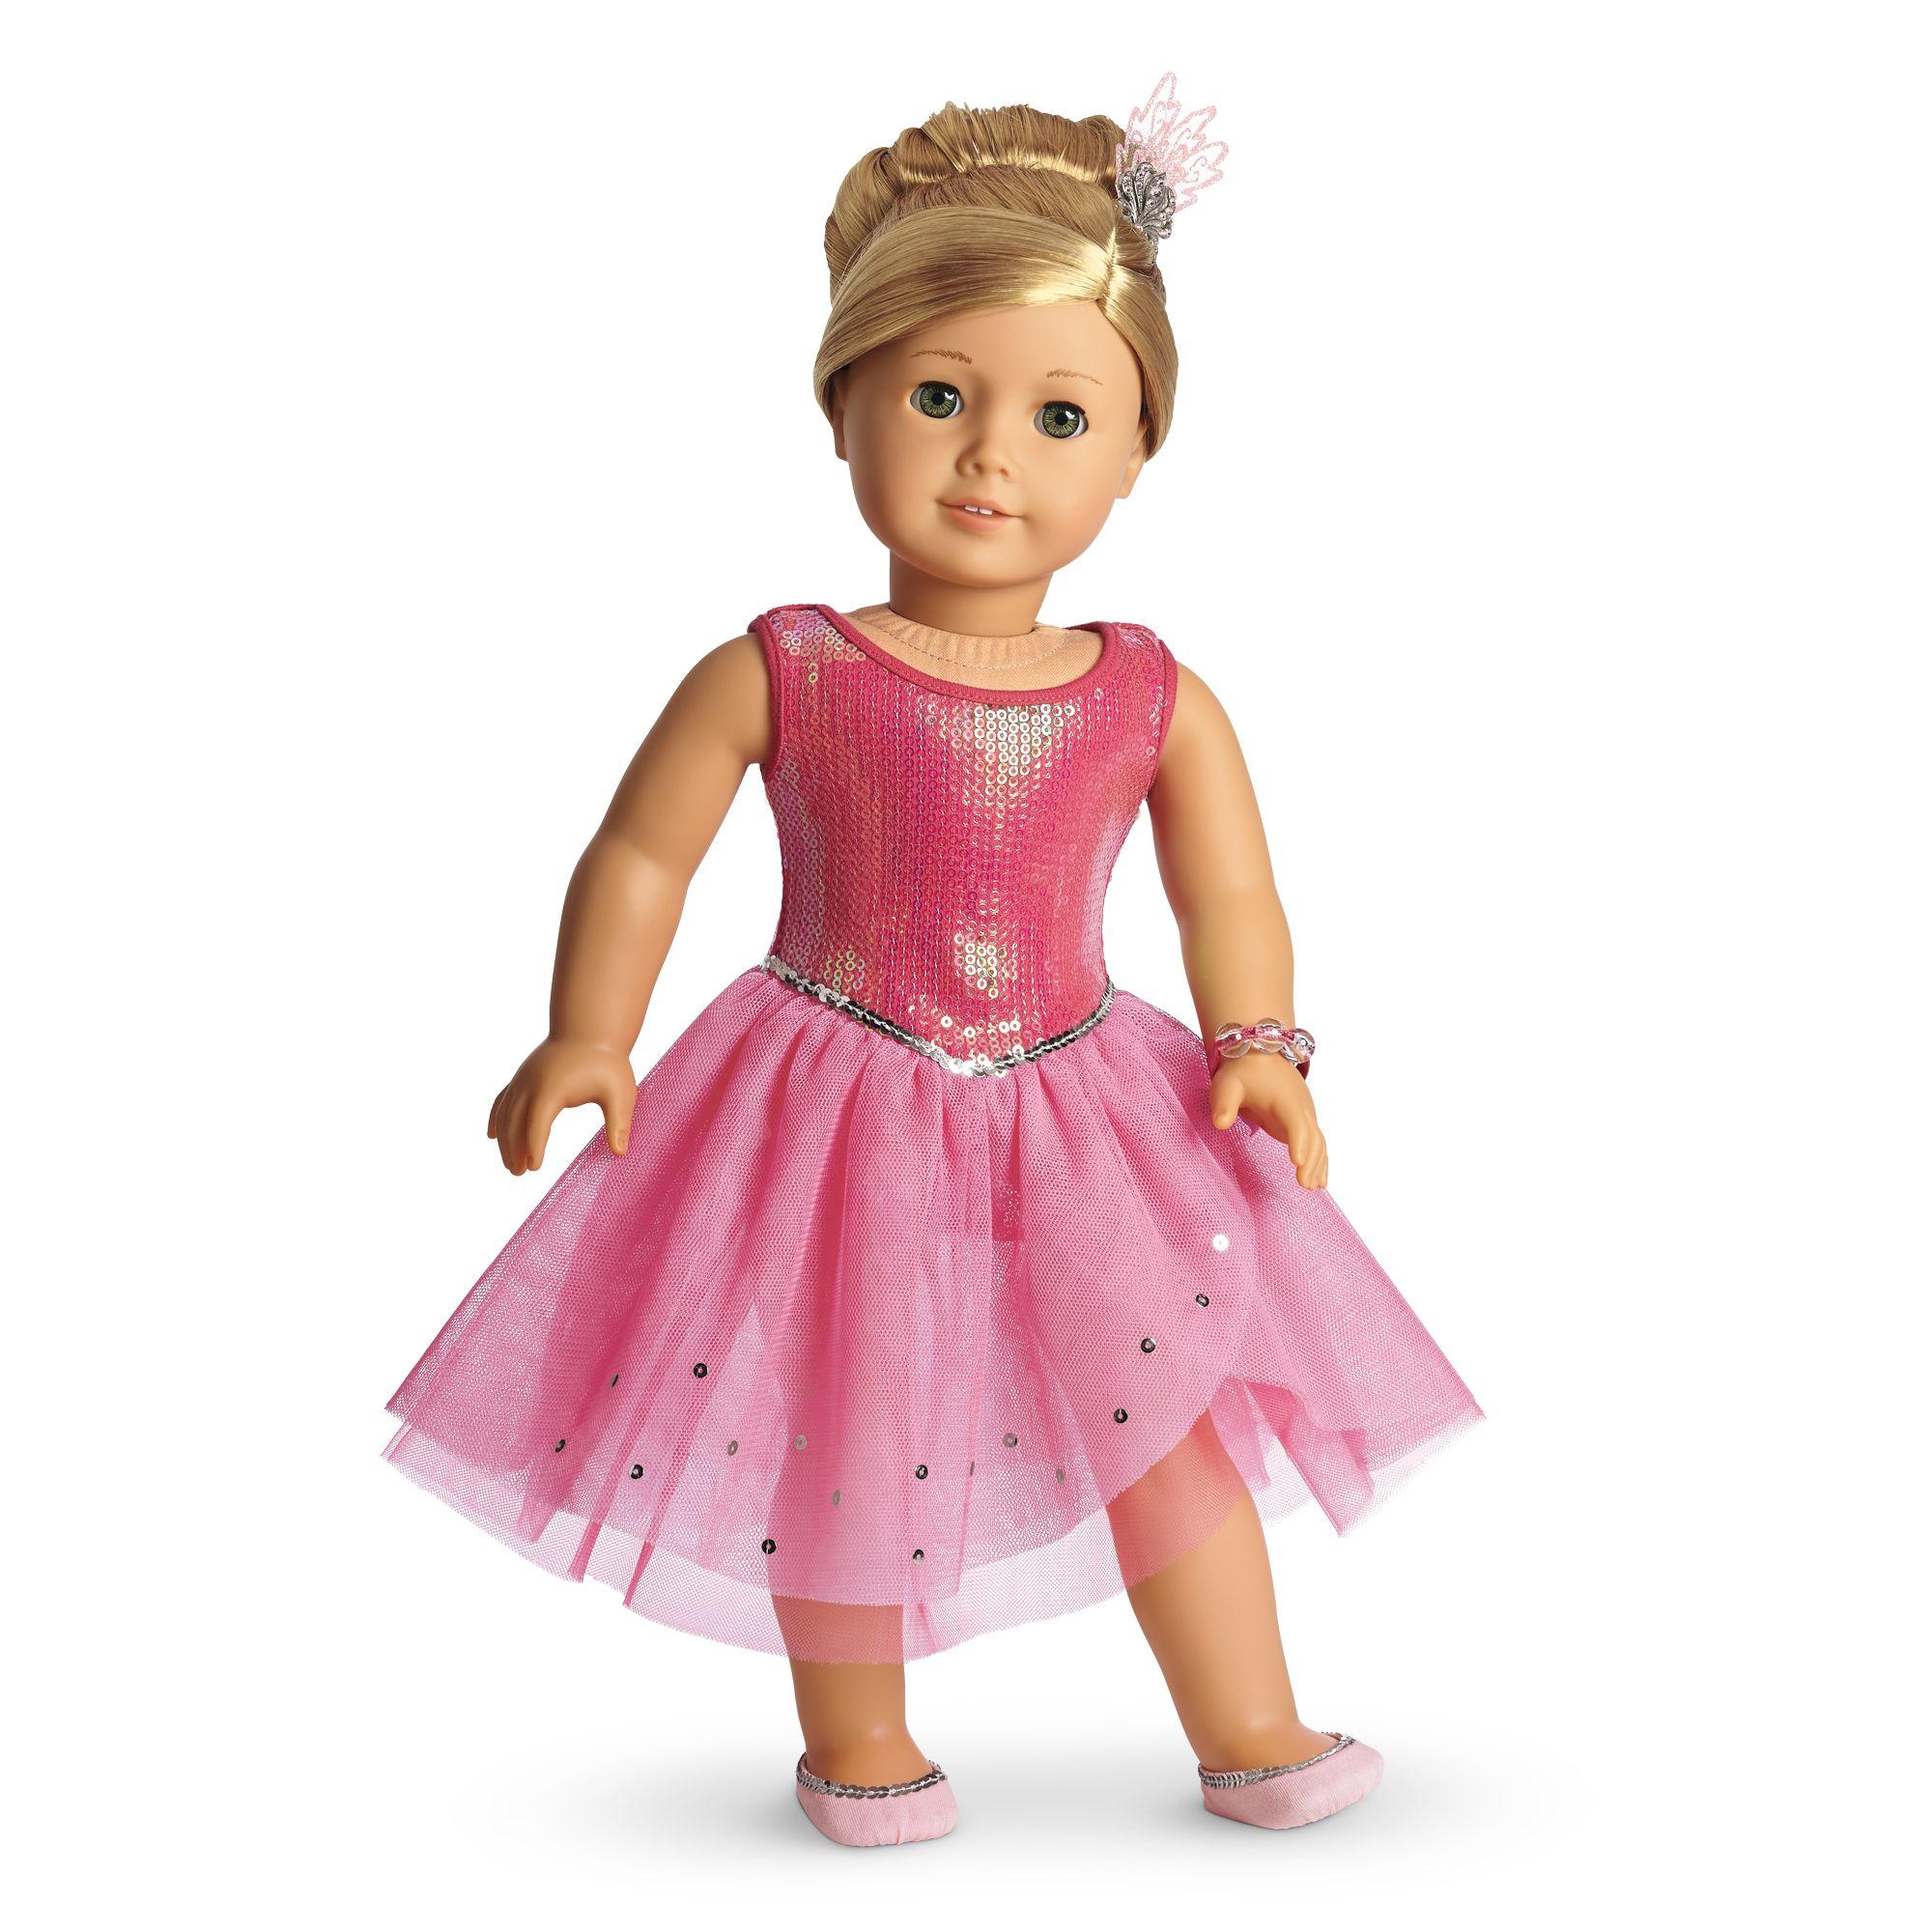 Isabelle's Sparkle Dress